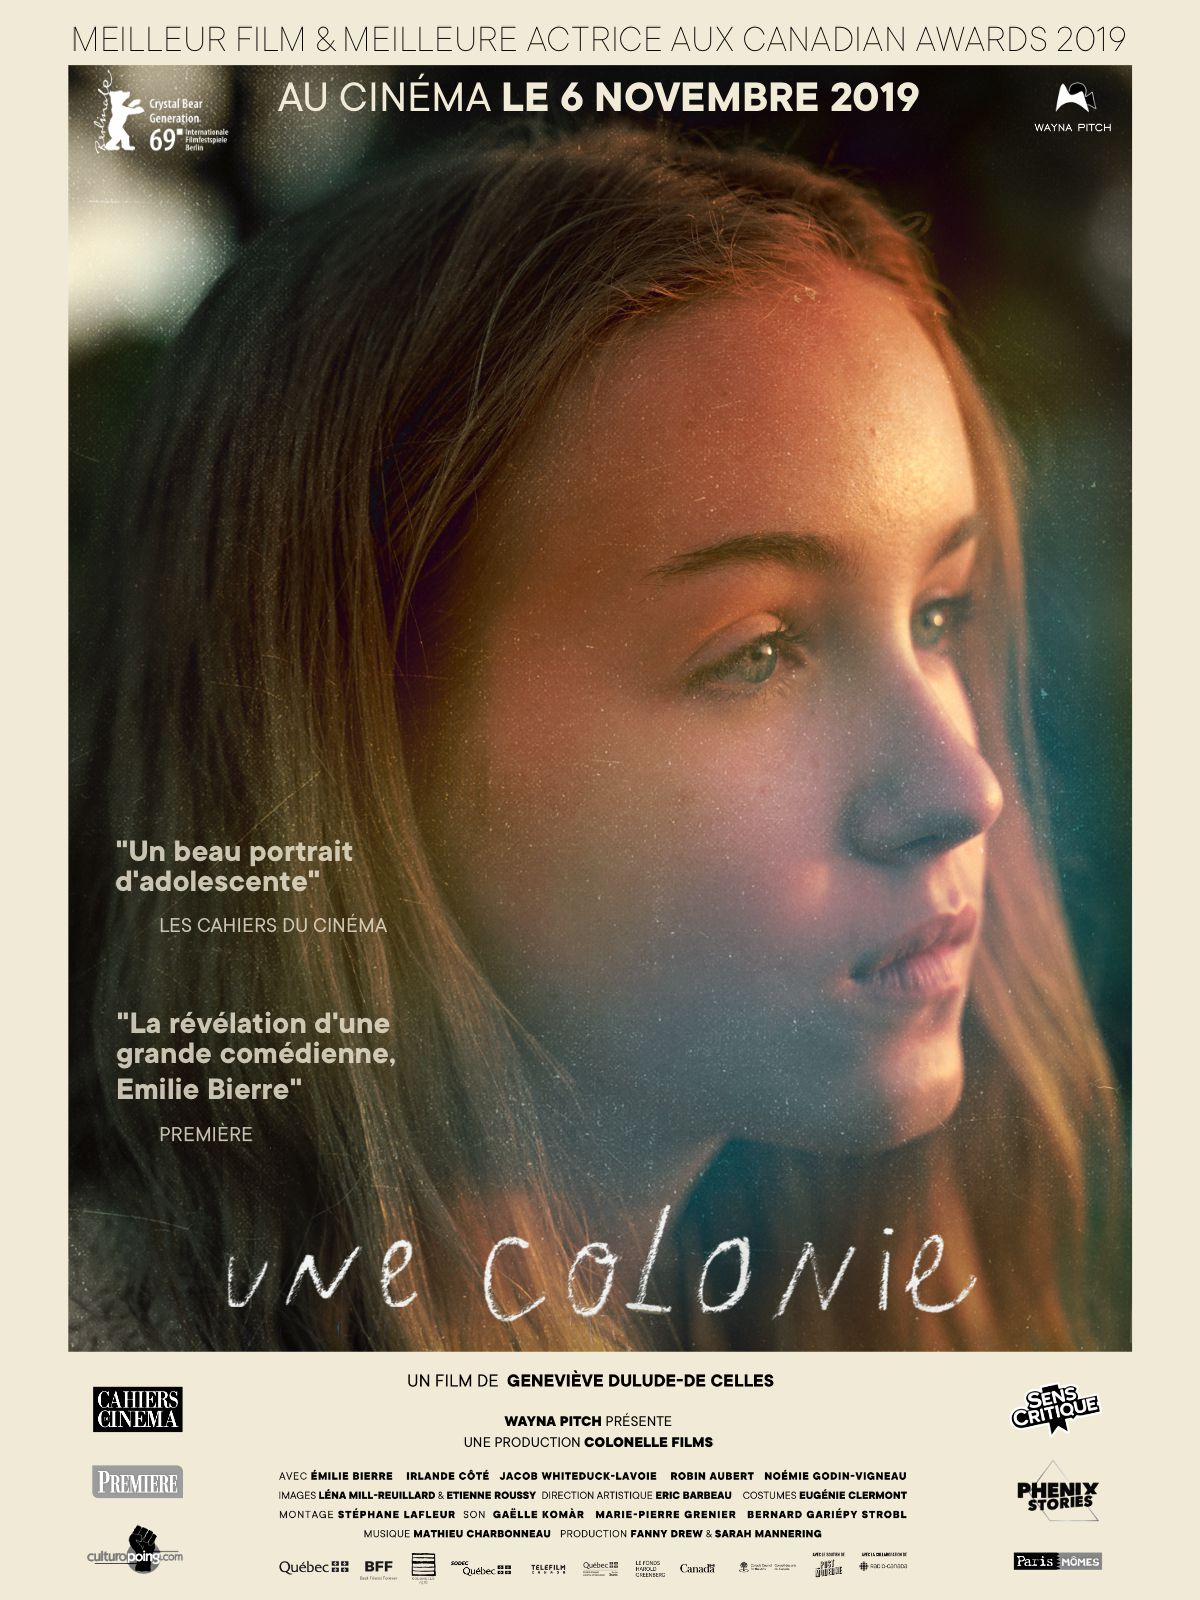 Une colonie - Film (2019)